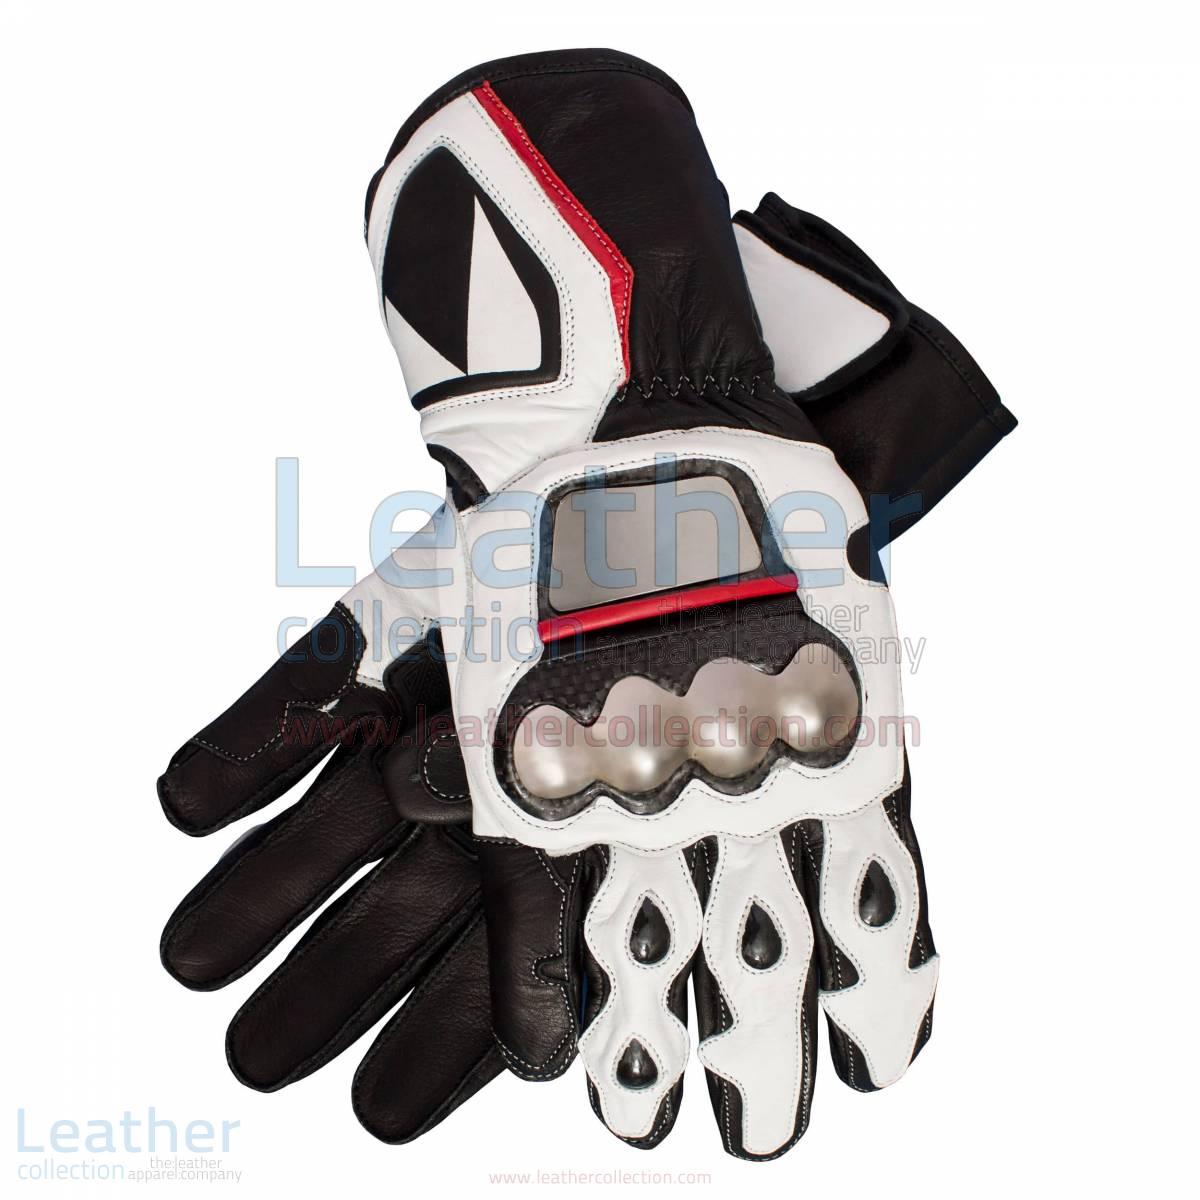 max biaggi motorcycle race gloves